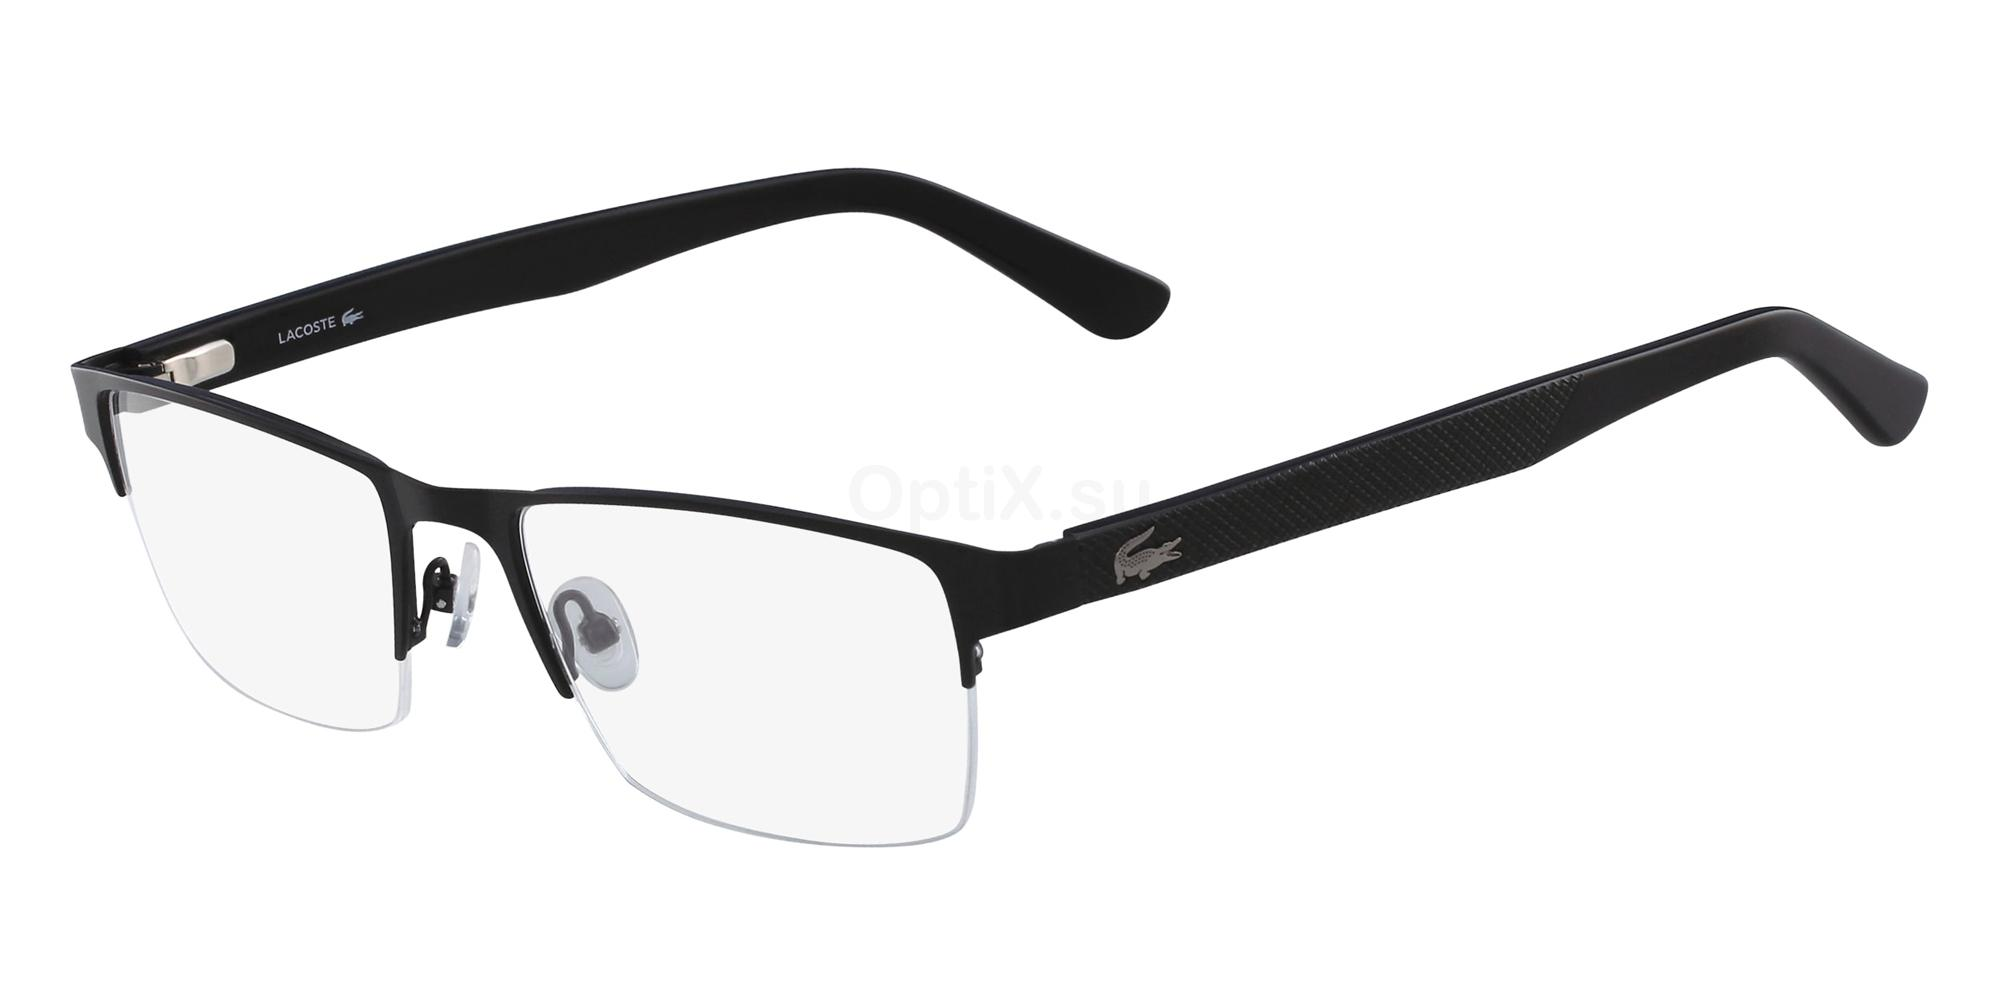 002 L2237 Glasses, Lacoste